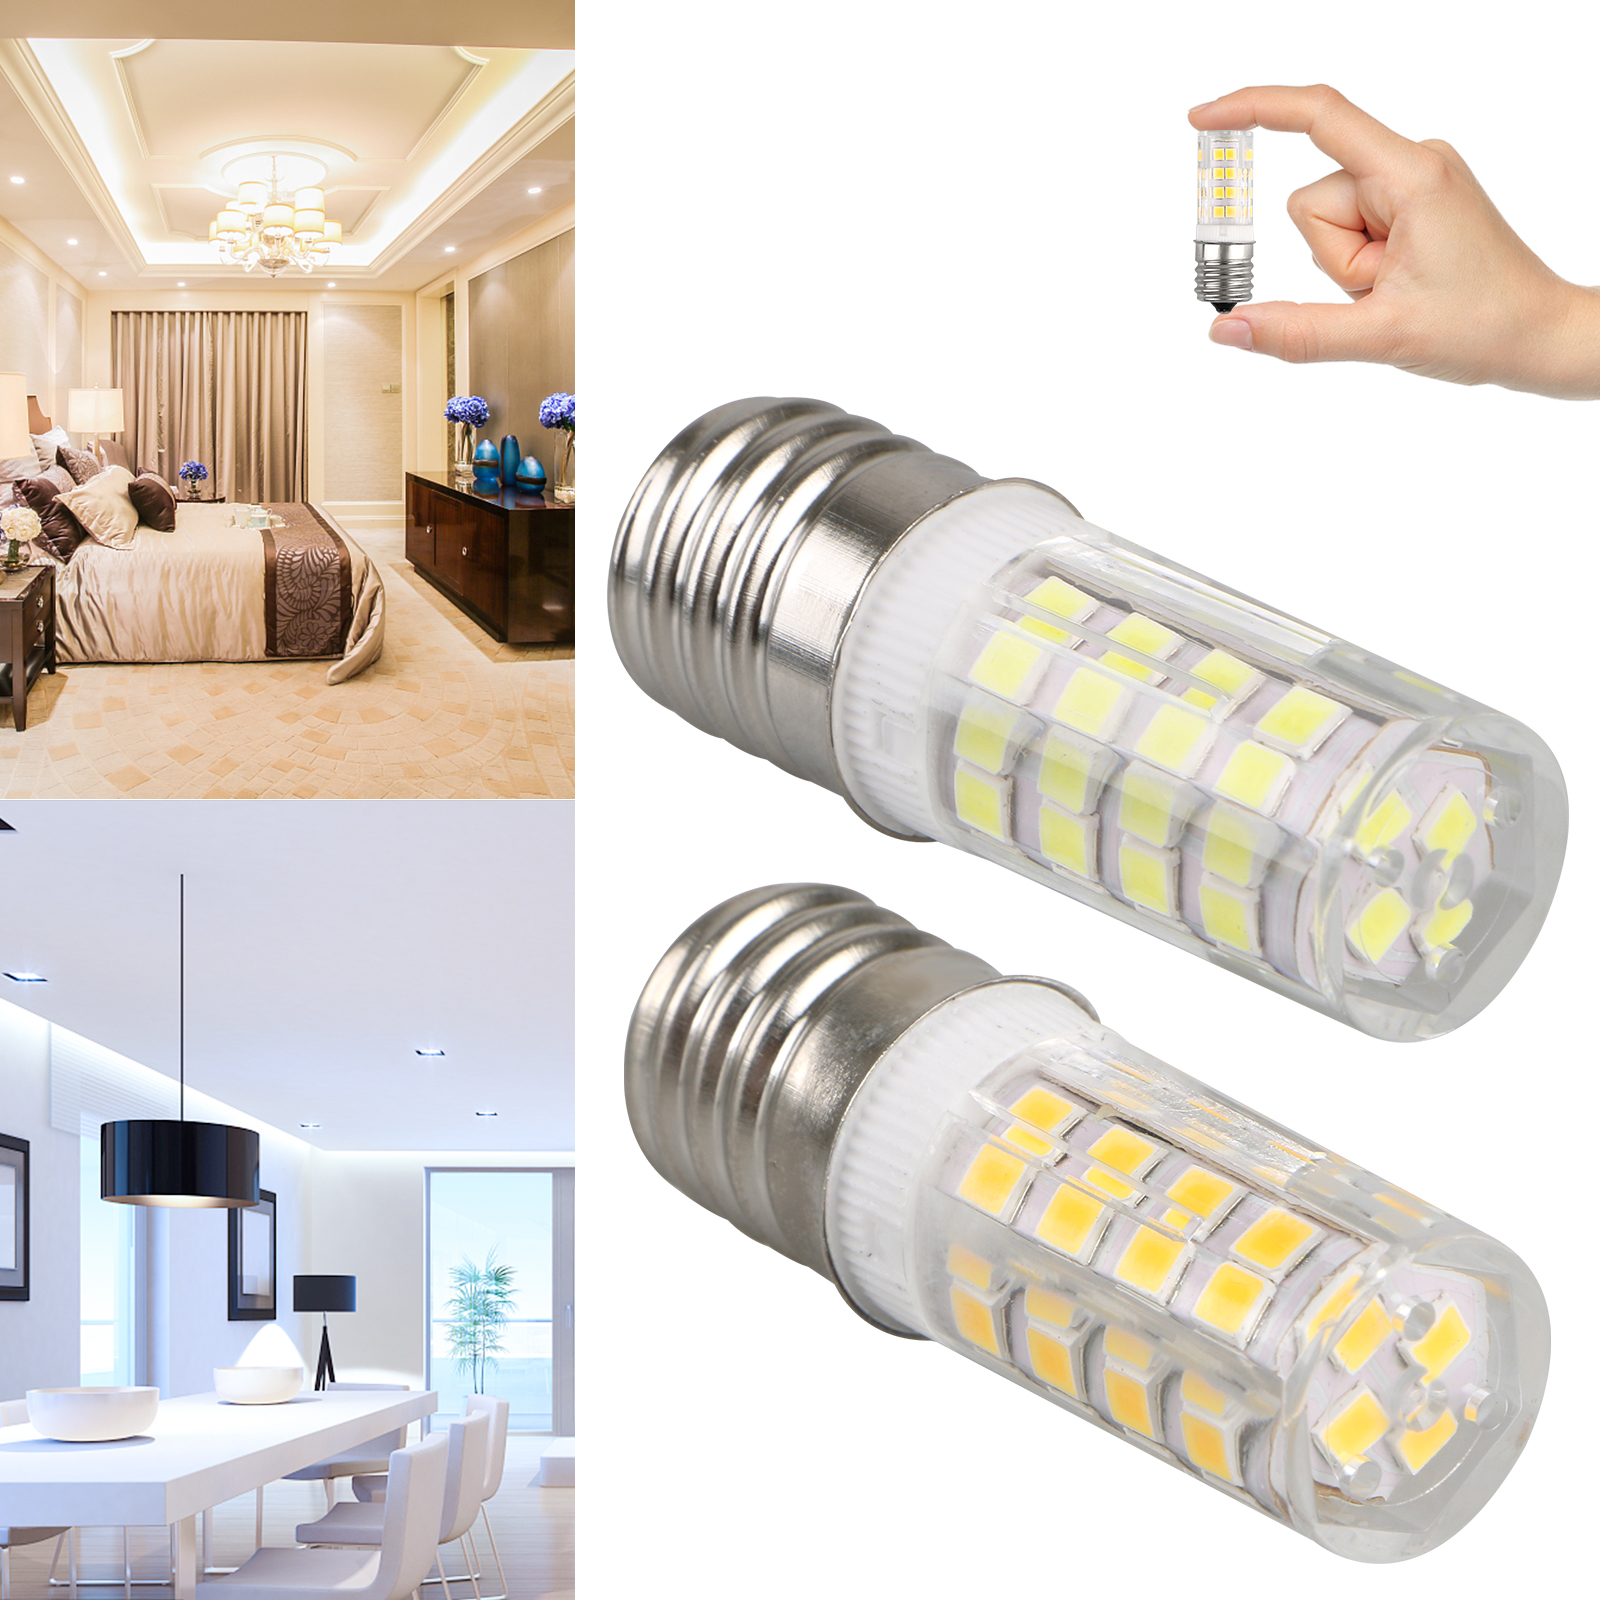 2Pcs Light Bulbs E17 SMD LED Microwave Oven Freezer 110-220V Hall Bedroom